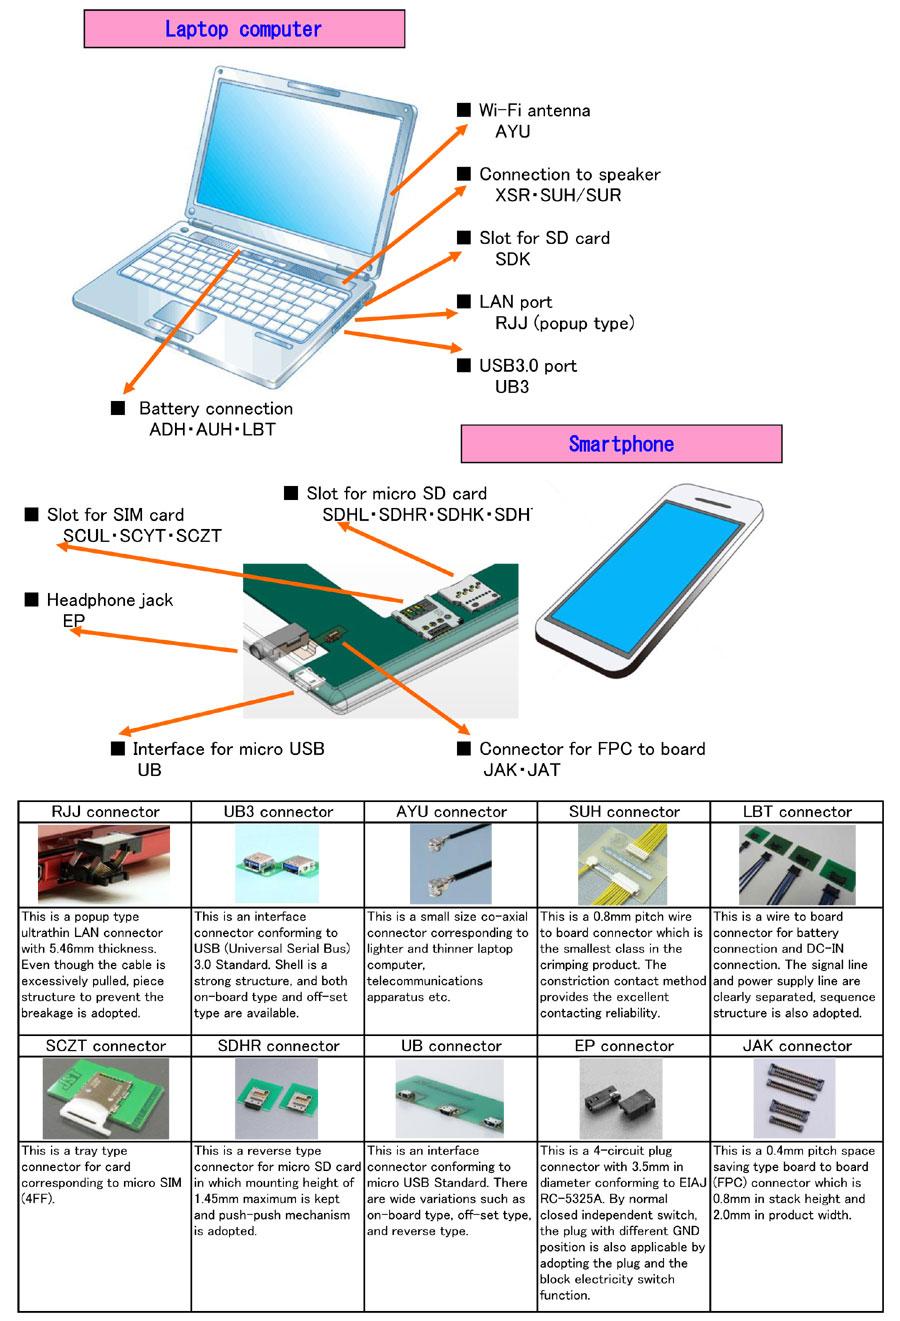 Informatic and communication equipment